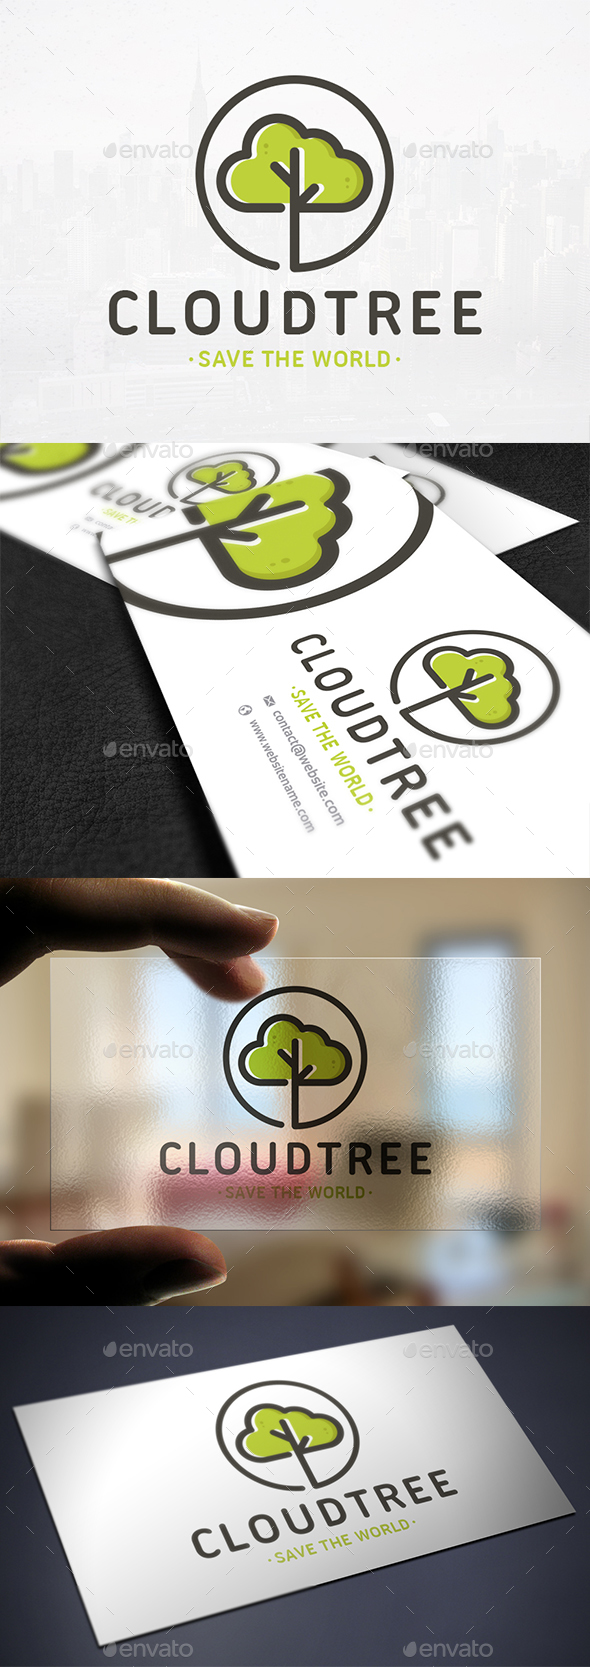 Cloud Tree Logo Template - Nature Logo Templates